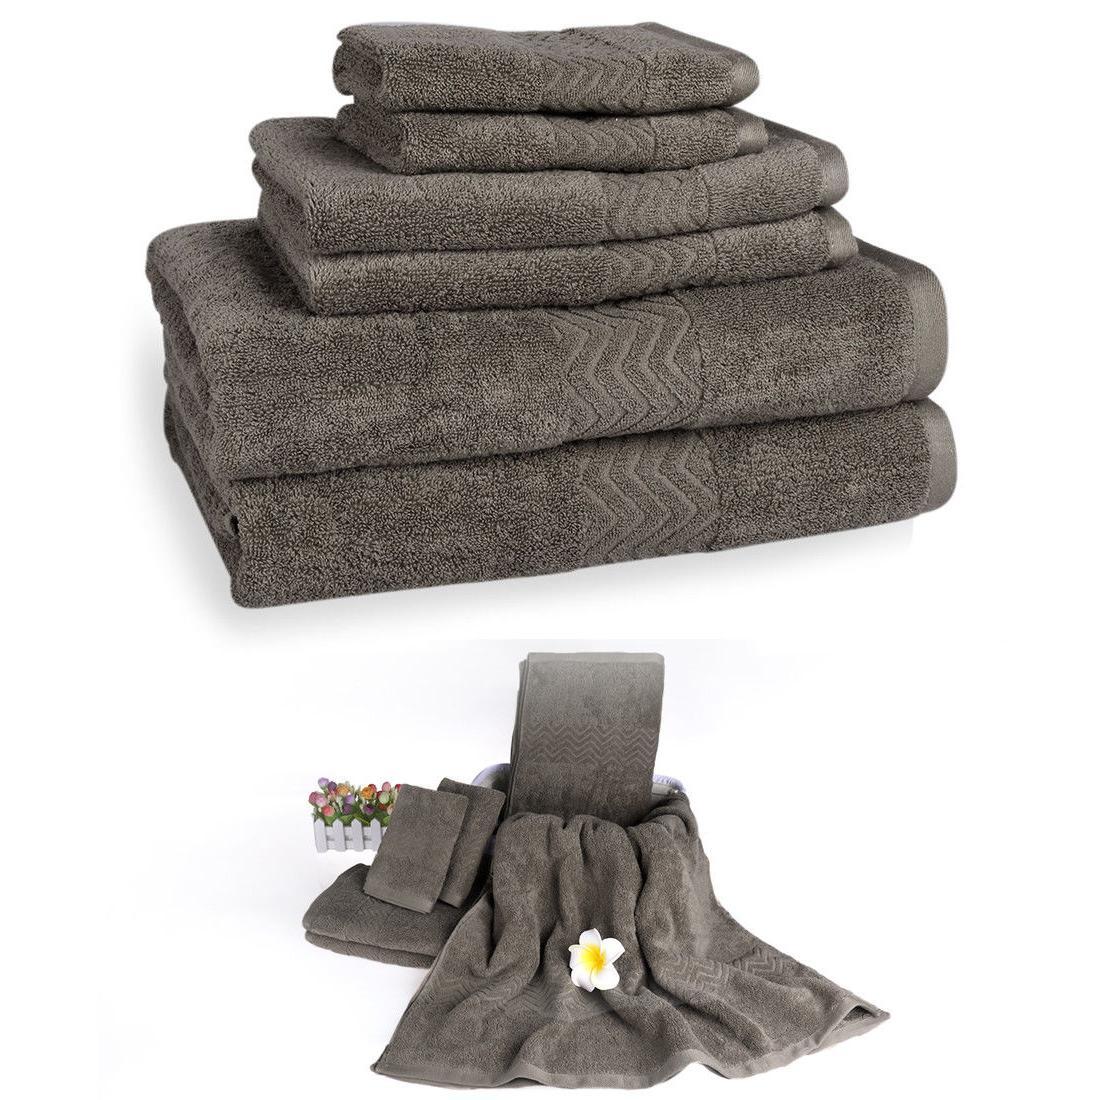 Bath Set Bathroom Towels Washcloths 100% Cotton 6 Solid Colors